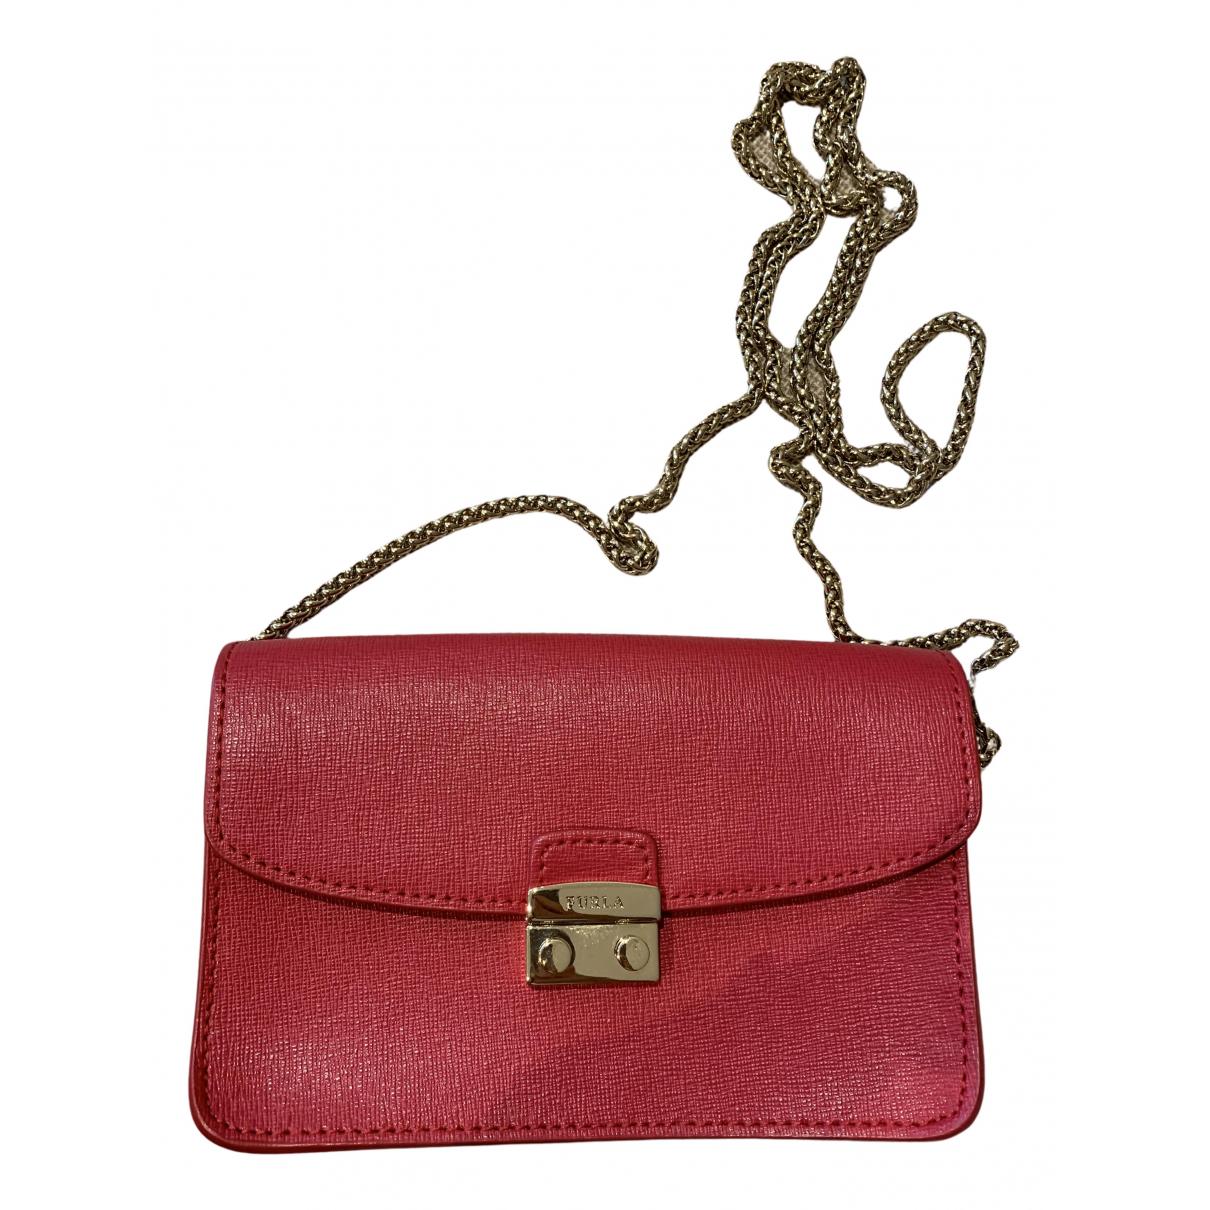 Furla N Red Leather Clutch bag for Women N